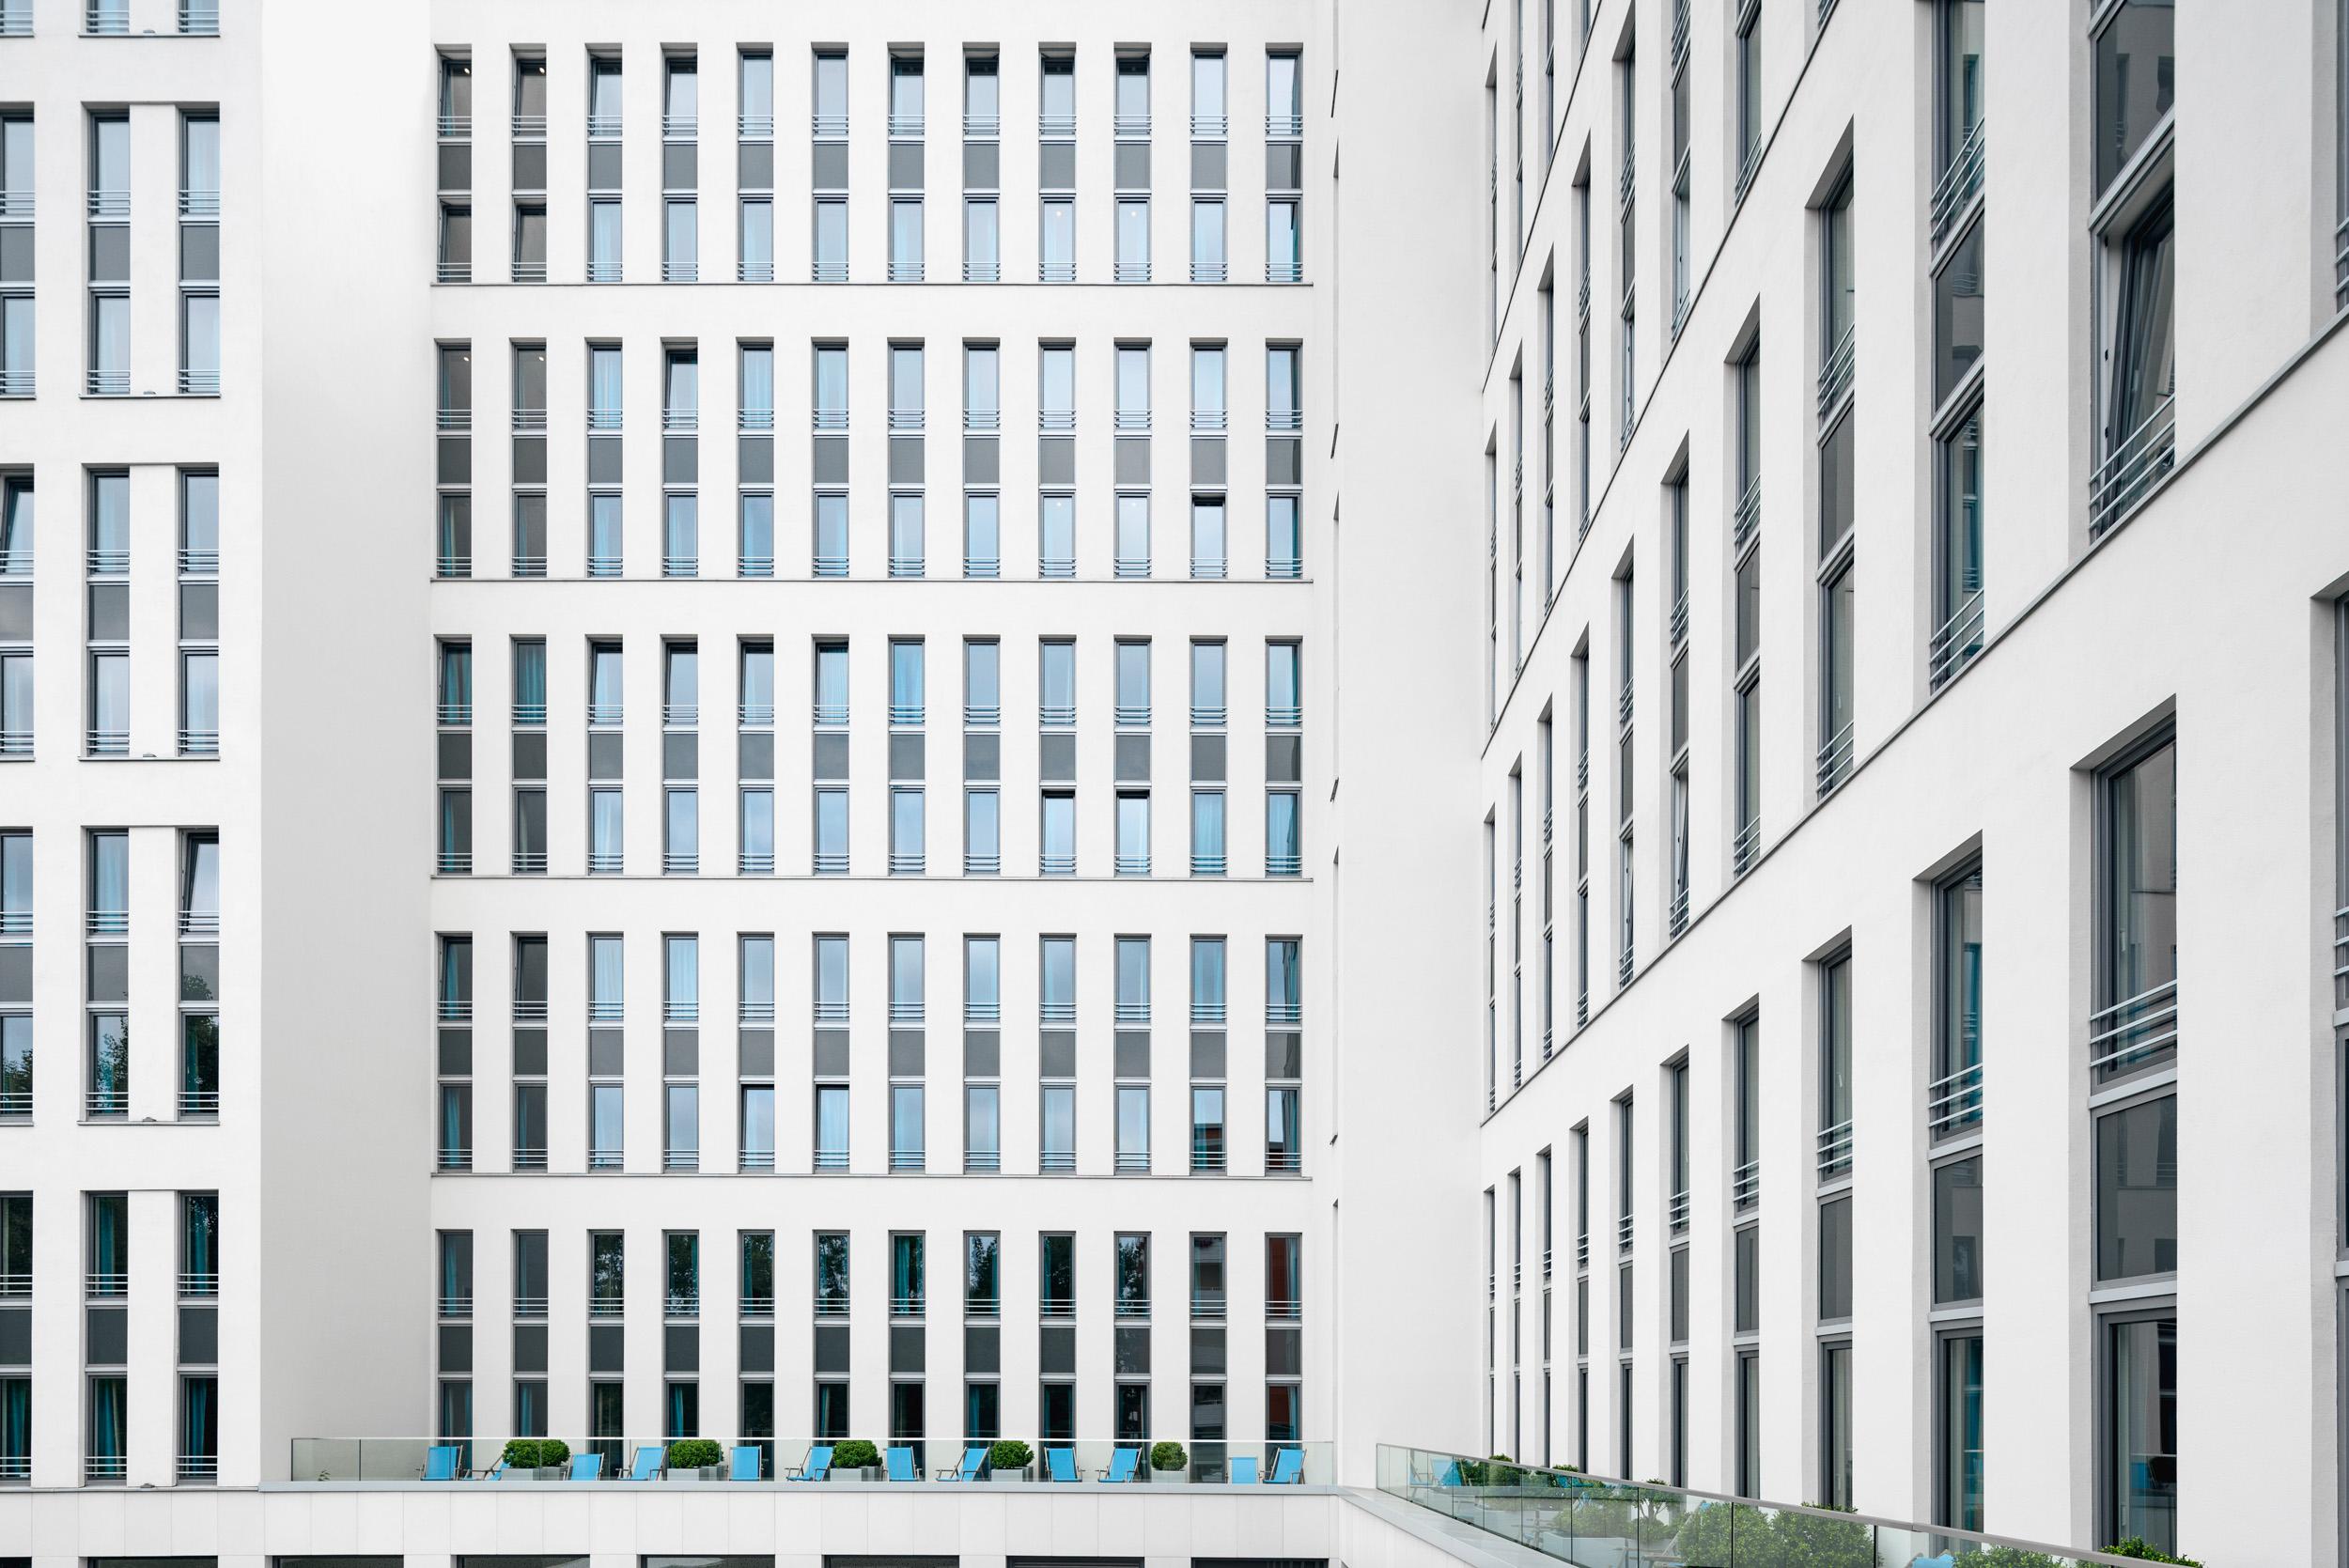 Gustav-Epple-Bauunternehmung-Motel-One-Berlin-HBF-MLX5806